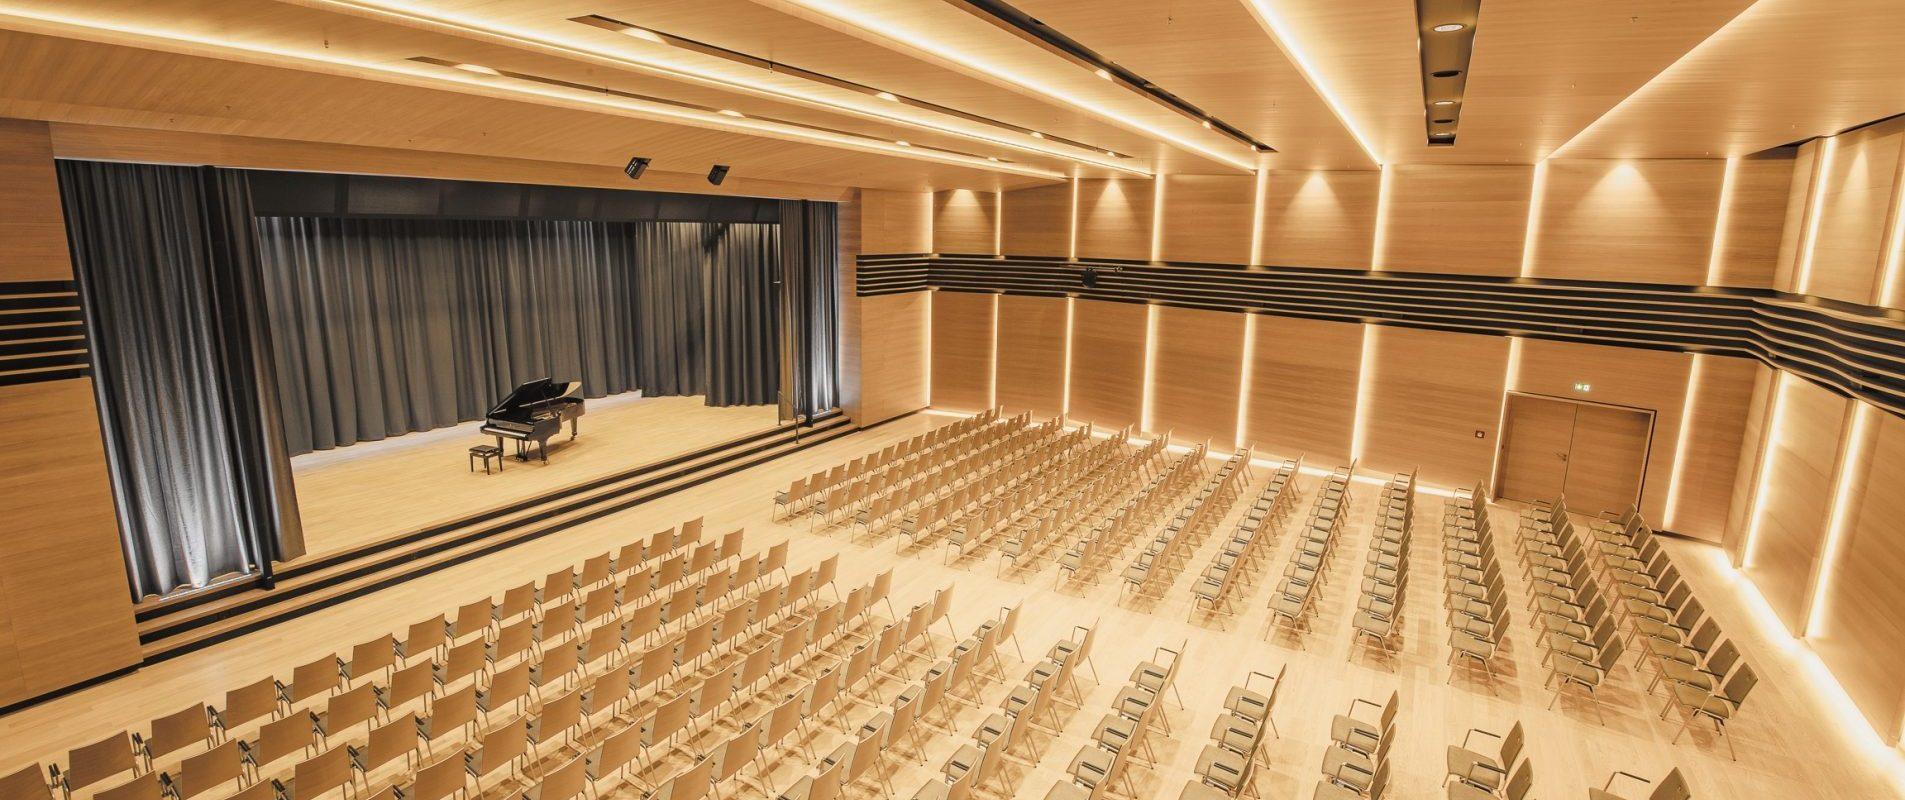 Konzertsaal - Wohnstift am Tiergarten